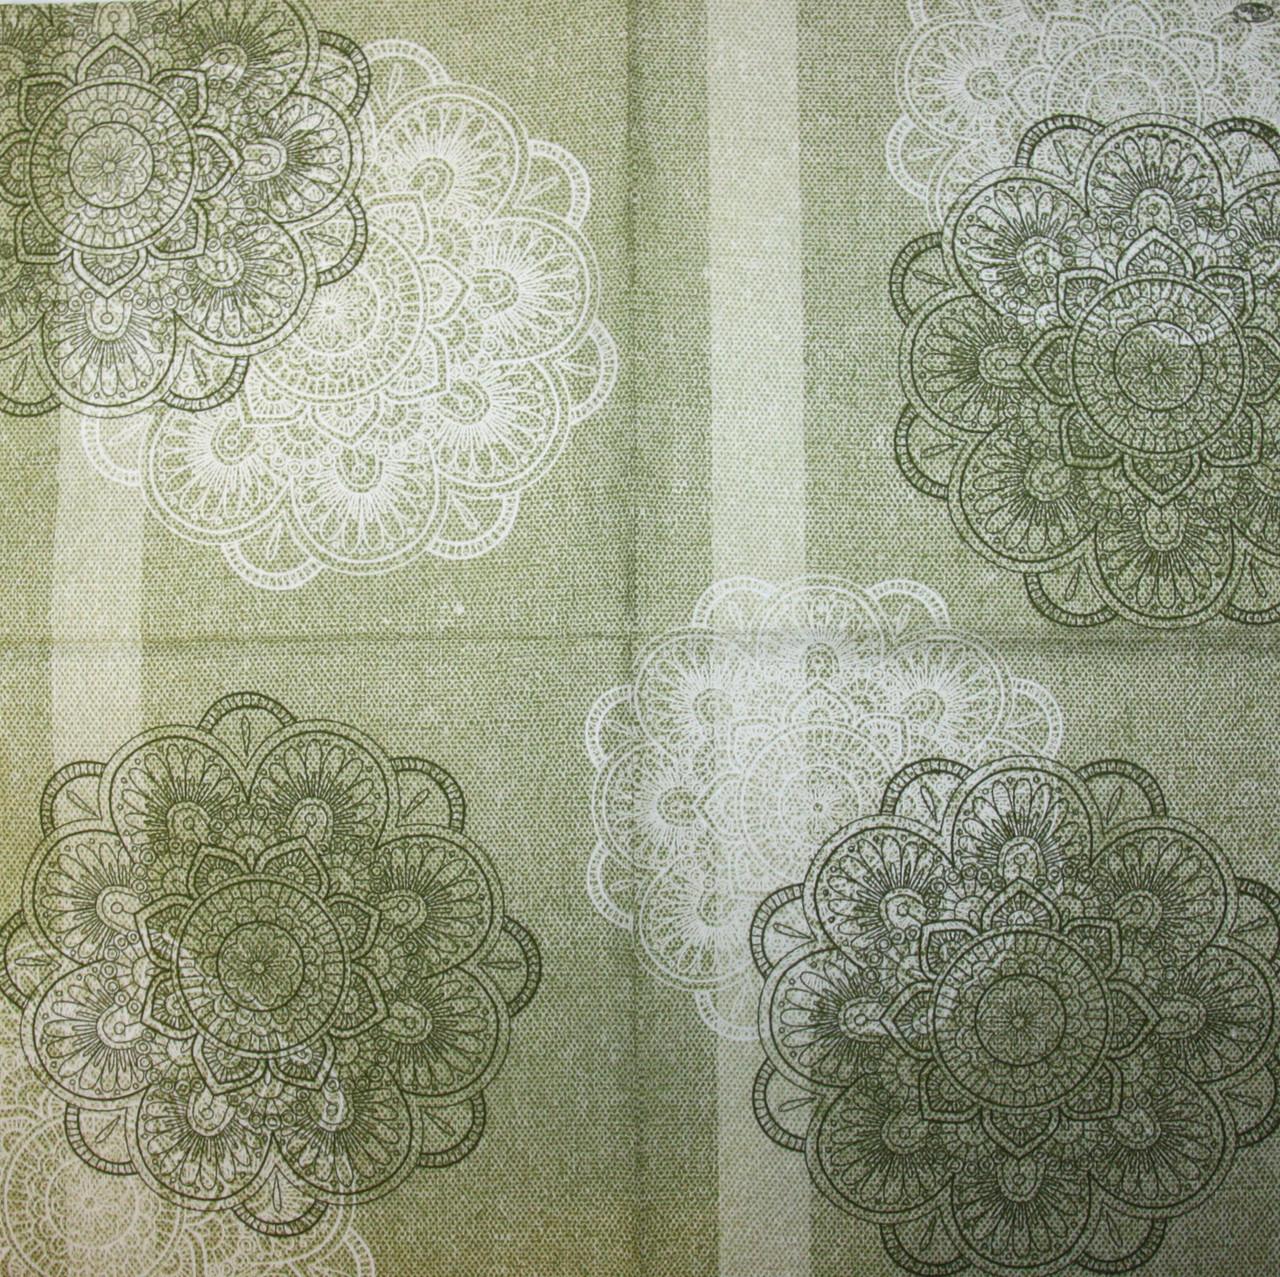 Салфетка для декупажа Орнамент зелёный 6161